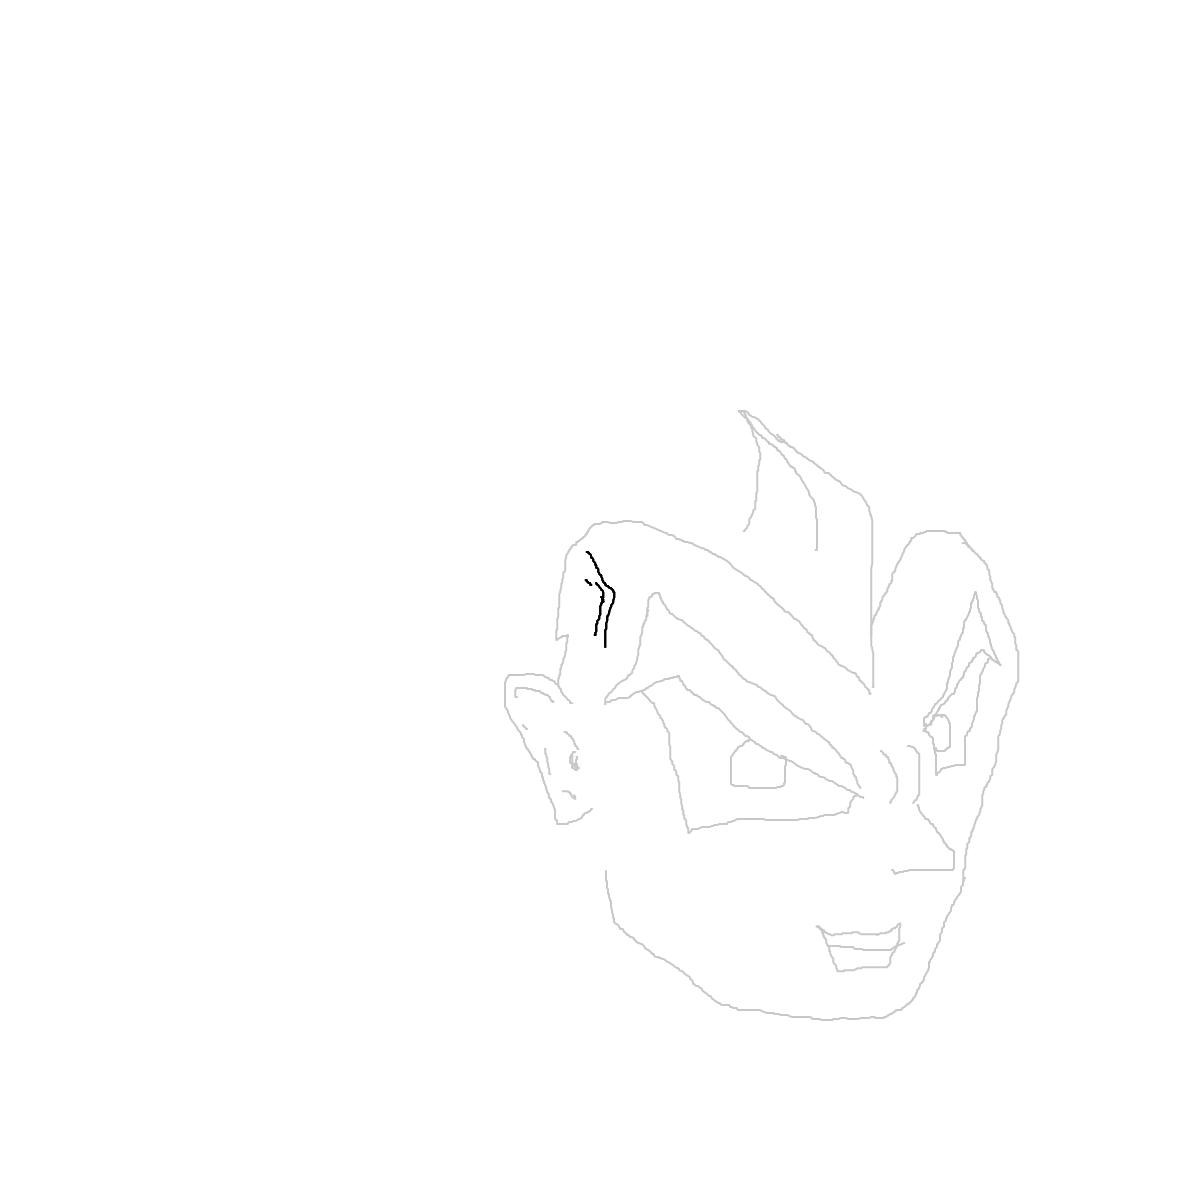 BAAAM drawing#5744 lat:35.6001663208007800lng: 139.4081268310547000